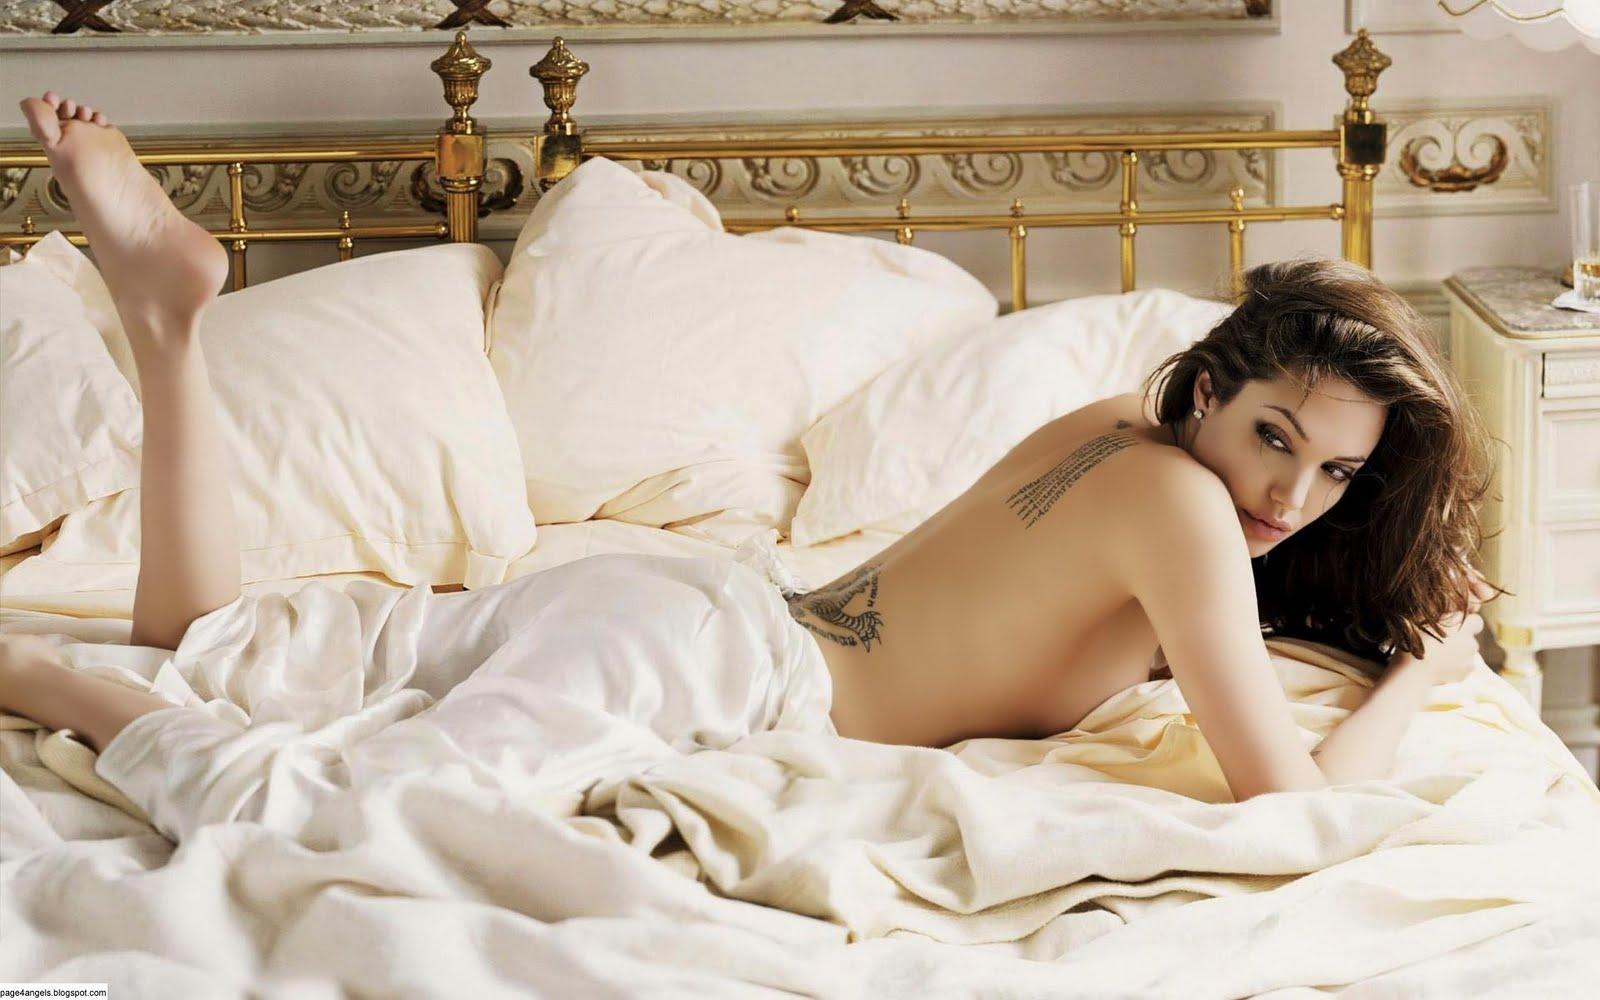 http://3.bp.blogspot.com/_-aLgbcBKmvc/TUQ3qvquPrI/AAAAAAAAEkQ/k9FRWsg3XVY/s1600/Angelina_Jolie_a_Wallpapers.jpg